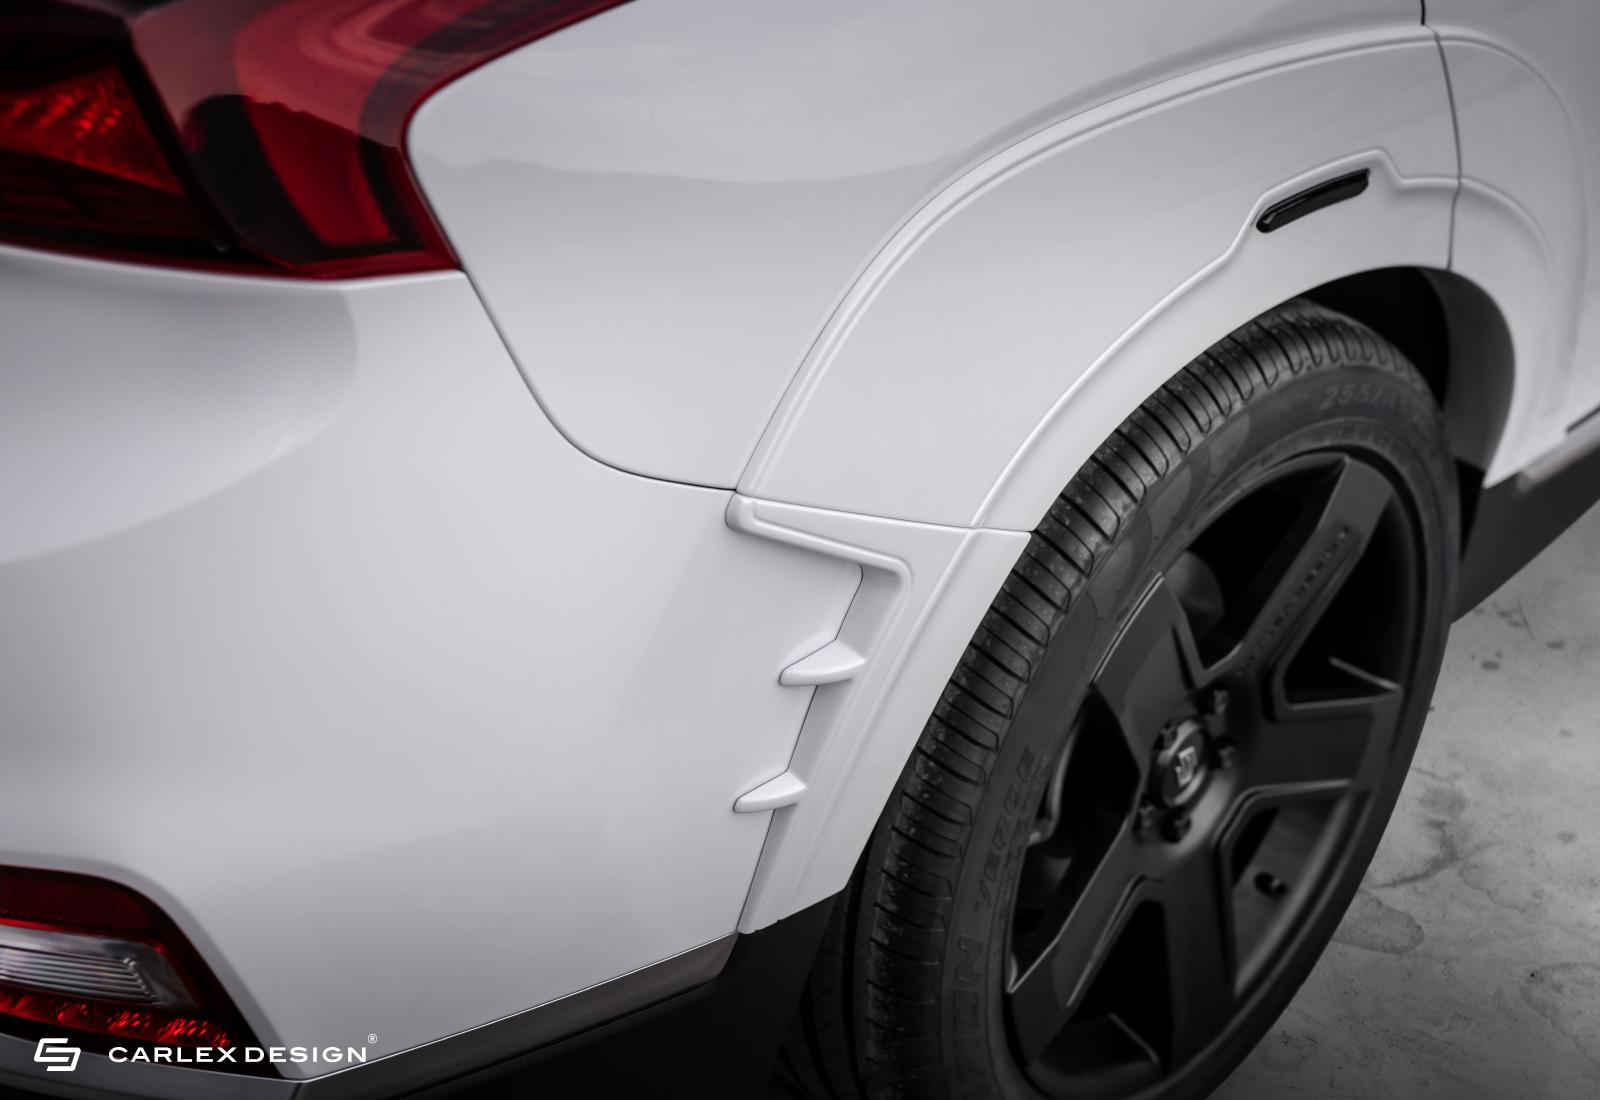 Hyundai-Santa-Fe-by-Carlex-Design-13